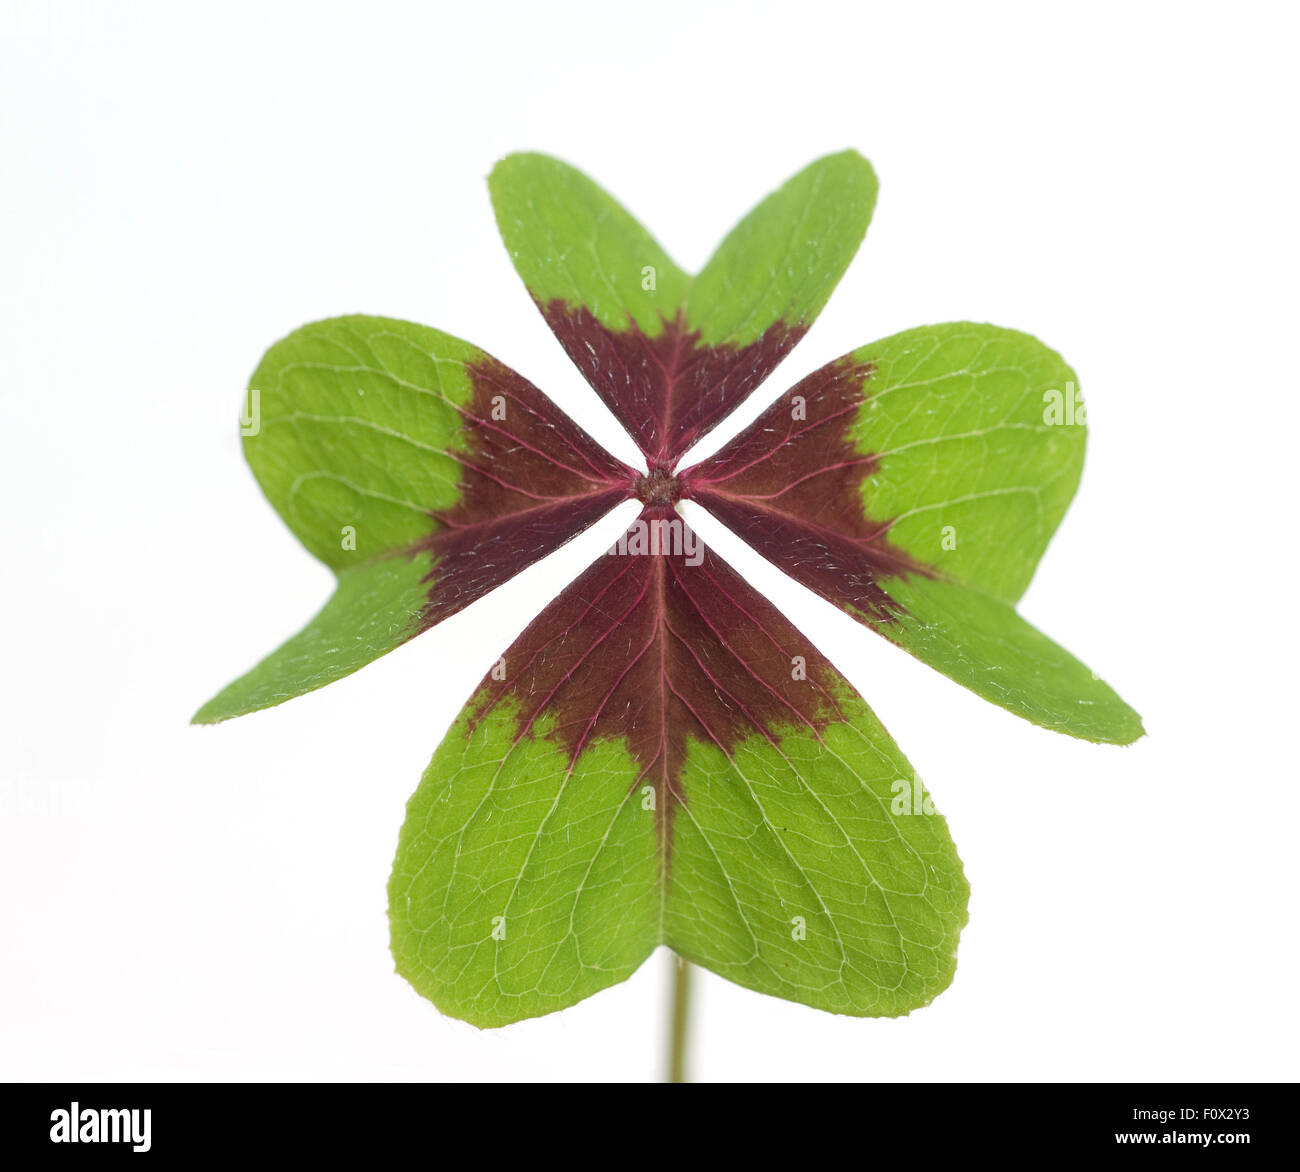 Gluecksklee, Oxalis tetraphylla, Vierblaettriger, Sauerklee - Stock Image